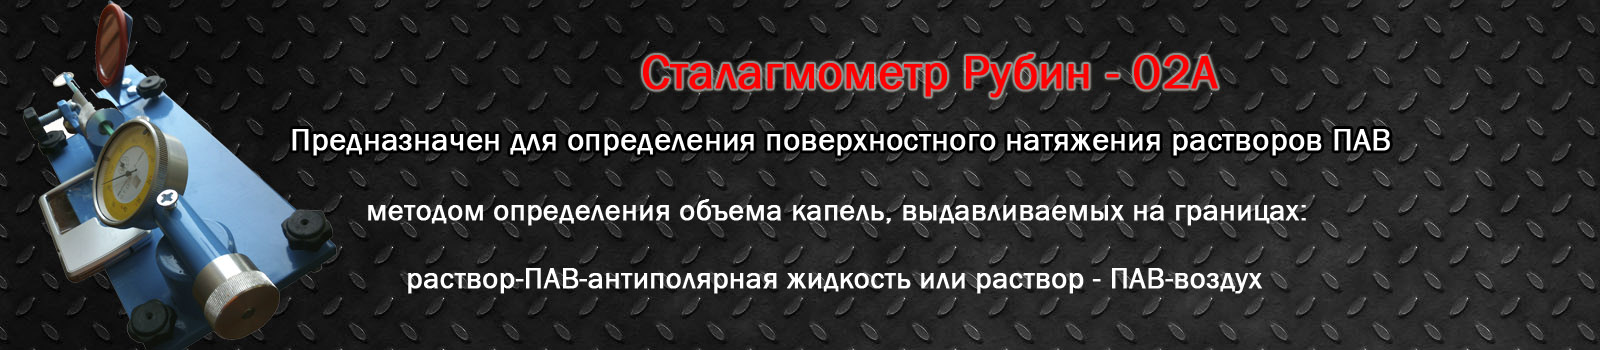 Сталагмометр Рубин - 02А